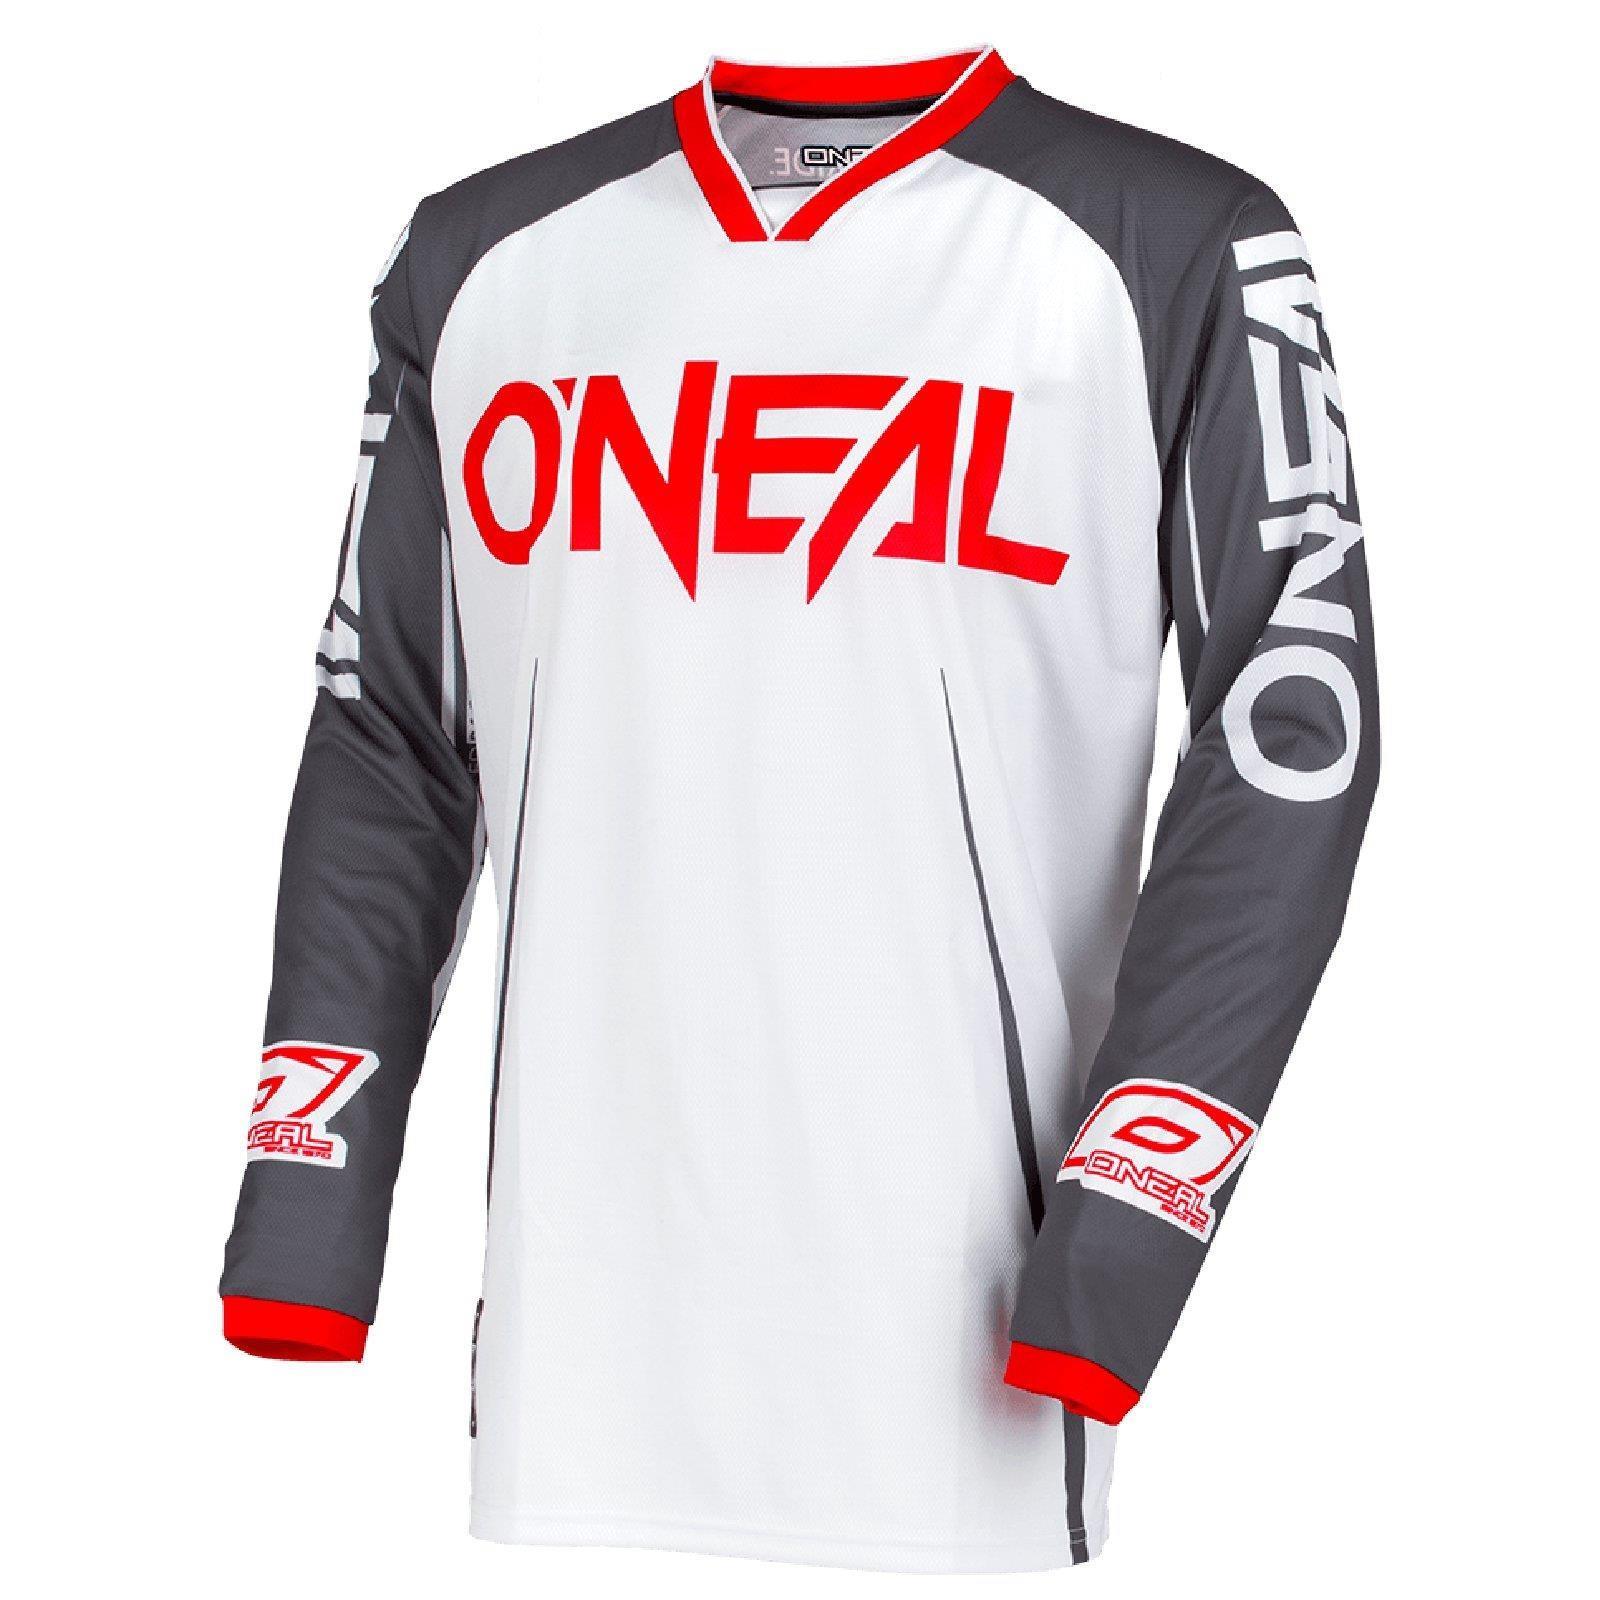 O-039-Neal-Mayhem-bloccanti-MOTO-CROSS-Jersey-Maglia-MX-Enduro-MTB-MOUNTAIN-BIKE-SHIRT miniatura 6